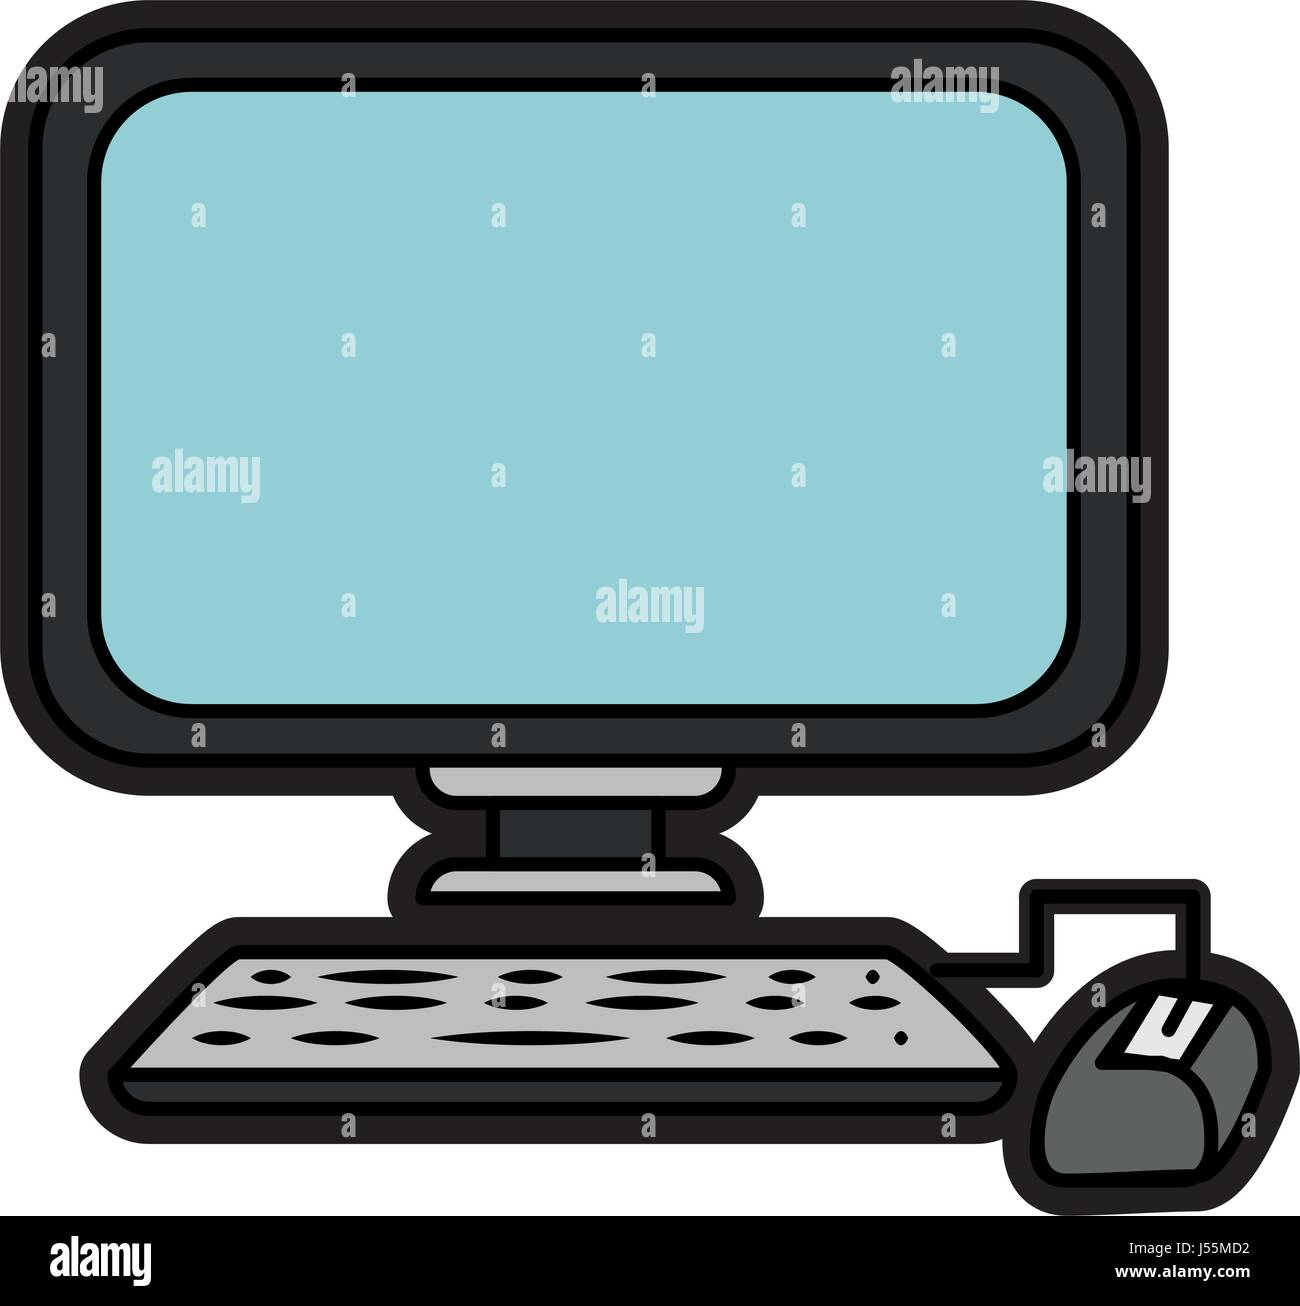 computer device icon - Stock Image